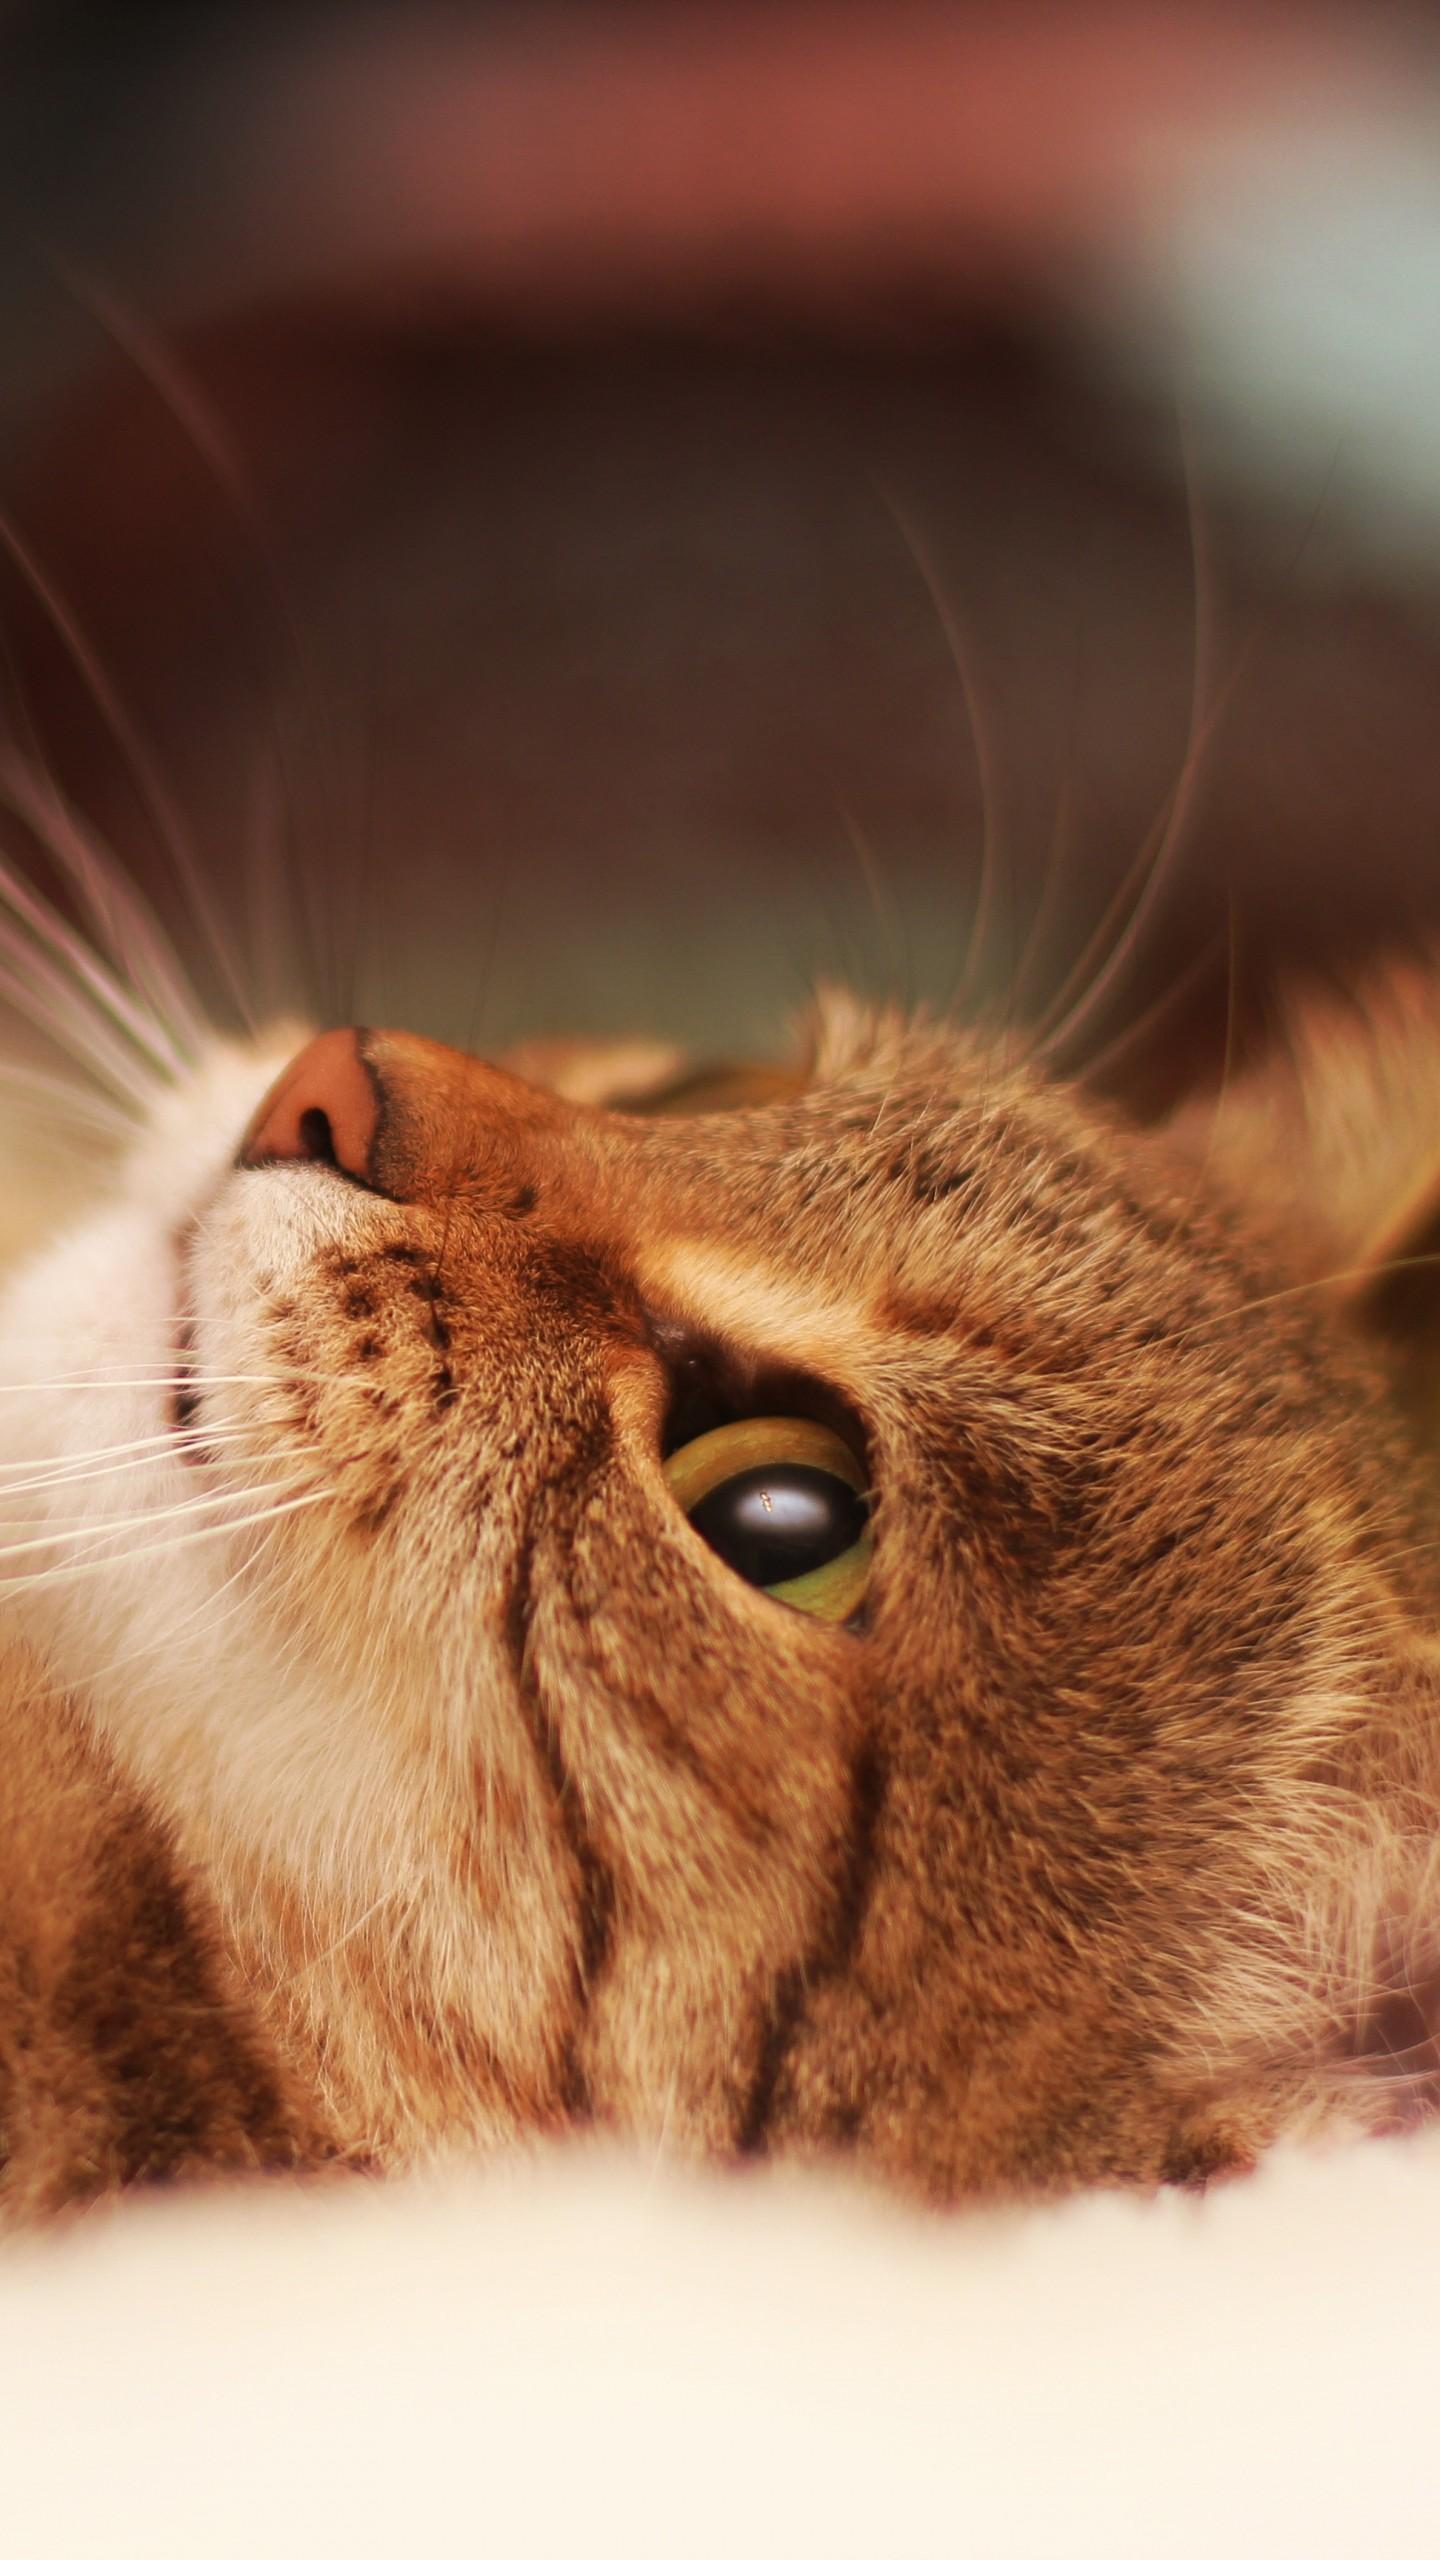 1440x2560 Wallpaper cat, lying, cool cat, beautiful cat 1440x2560